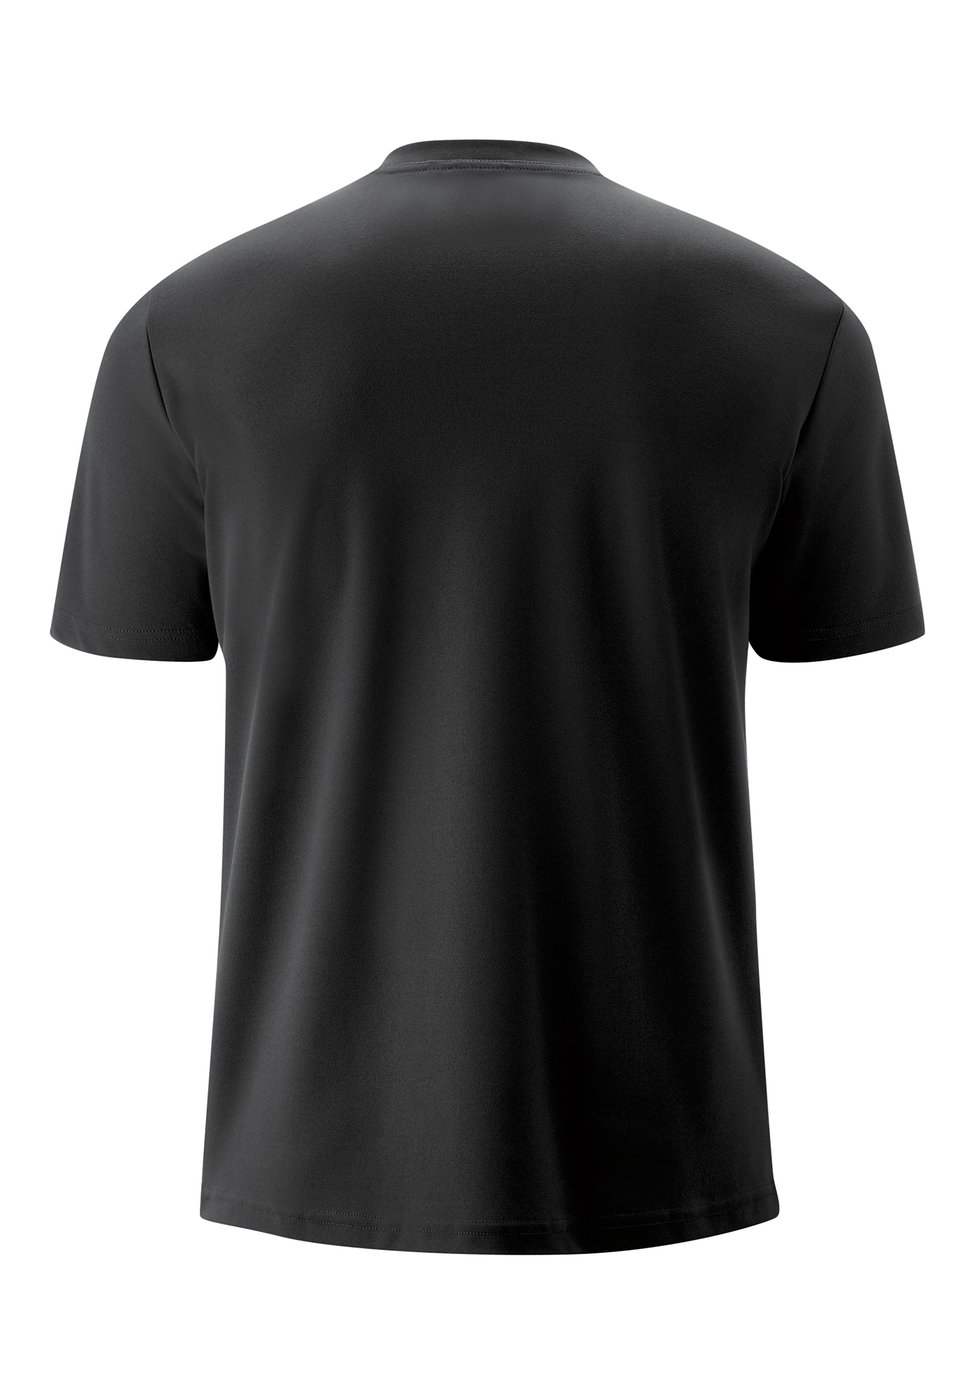 Maier Sports Hr. T-Shirt Wali 152308 schwarz